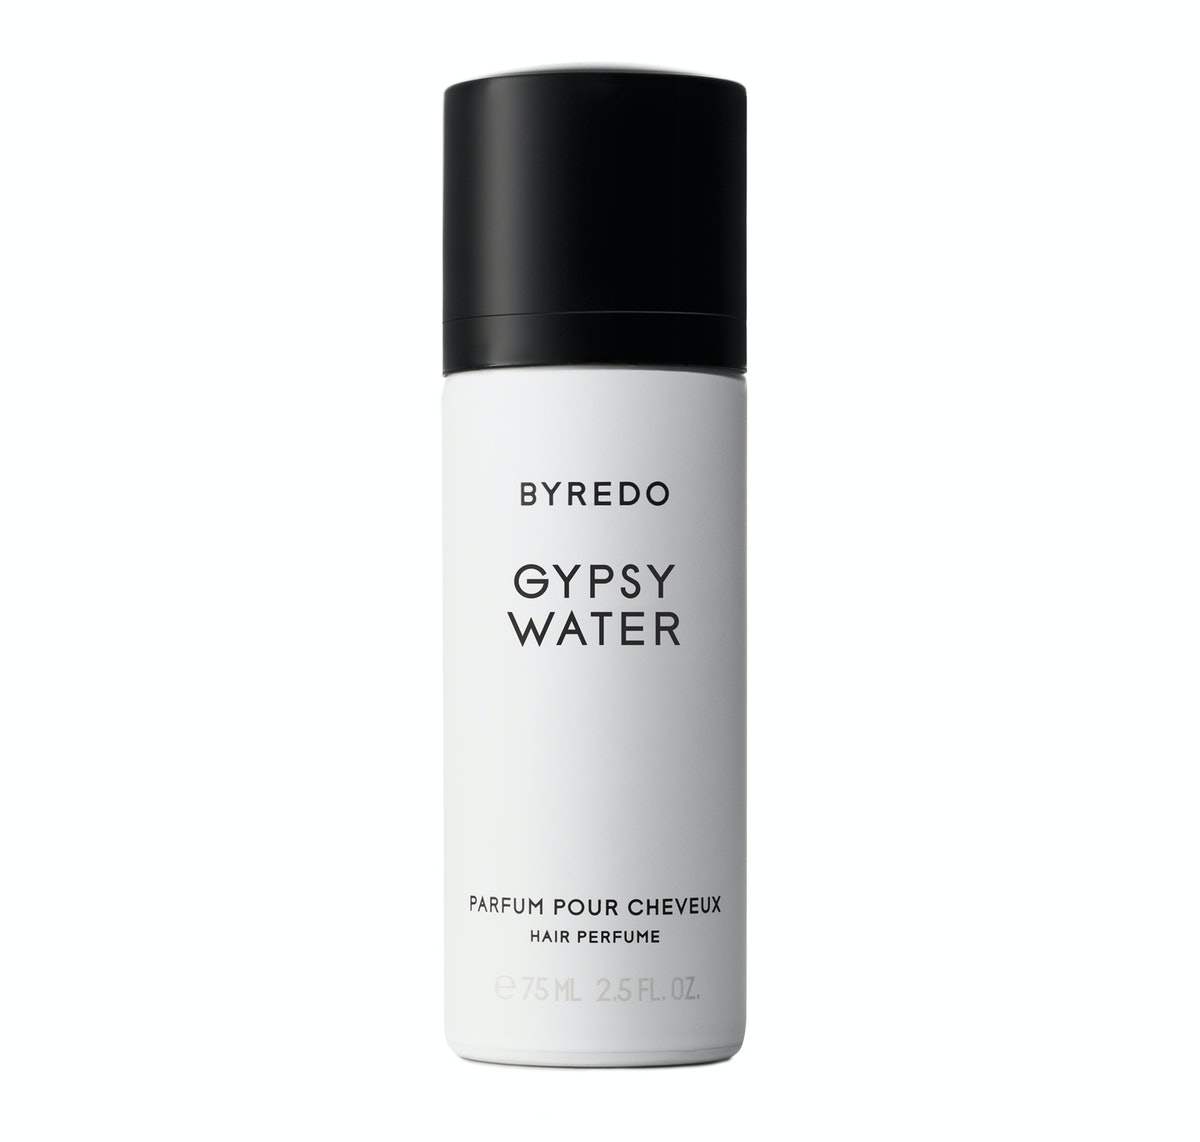 Byredo The Hair perfume